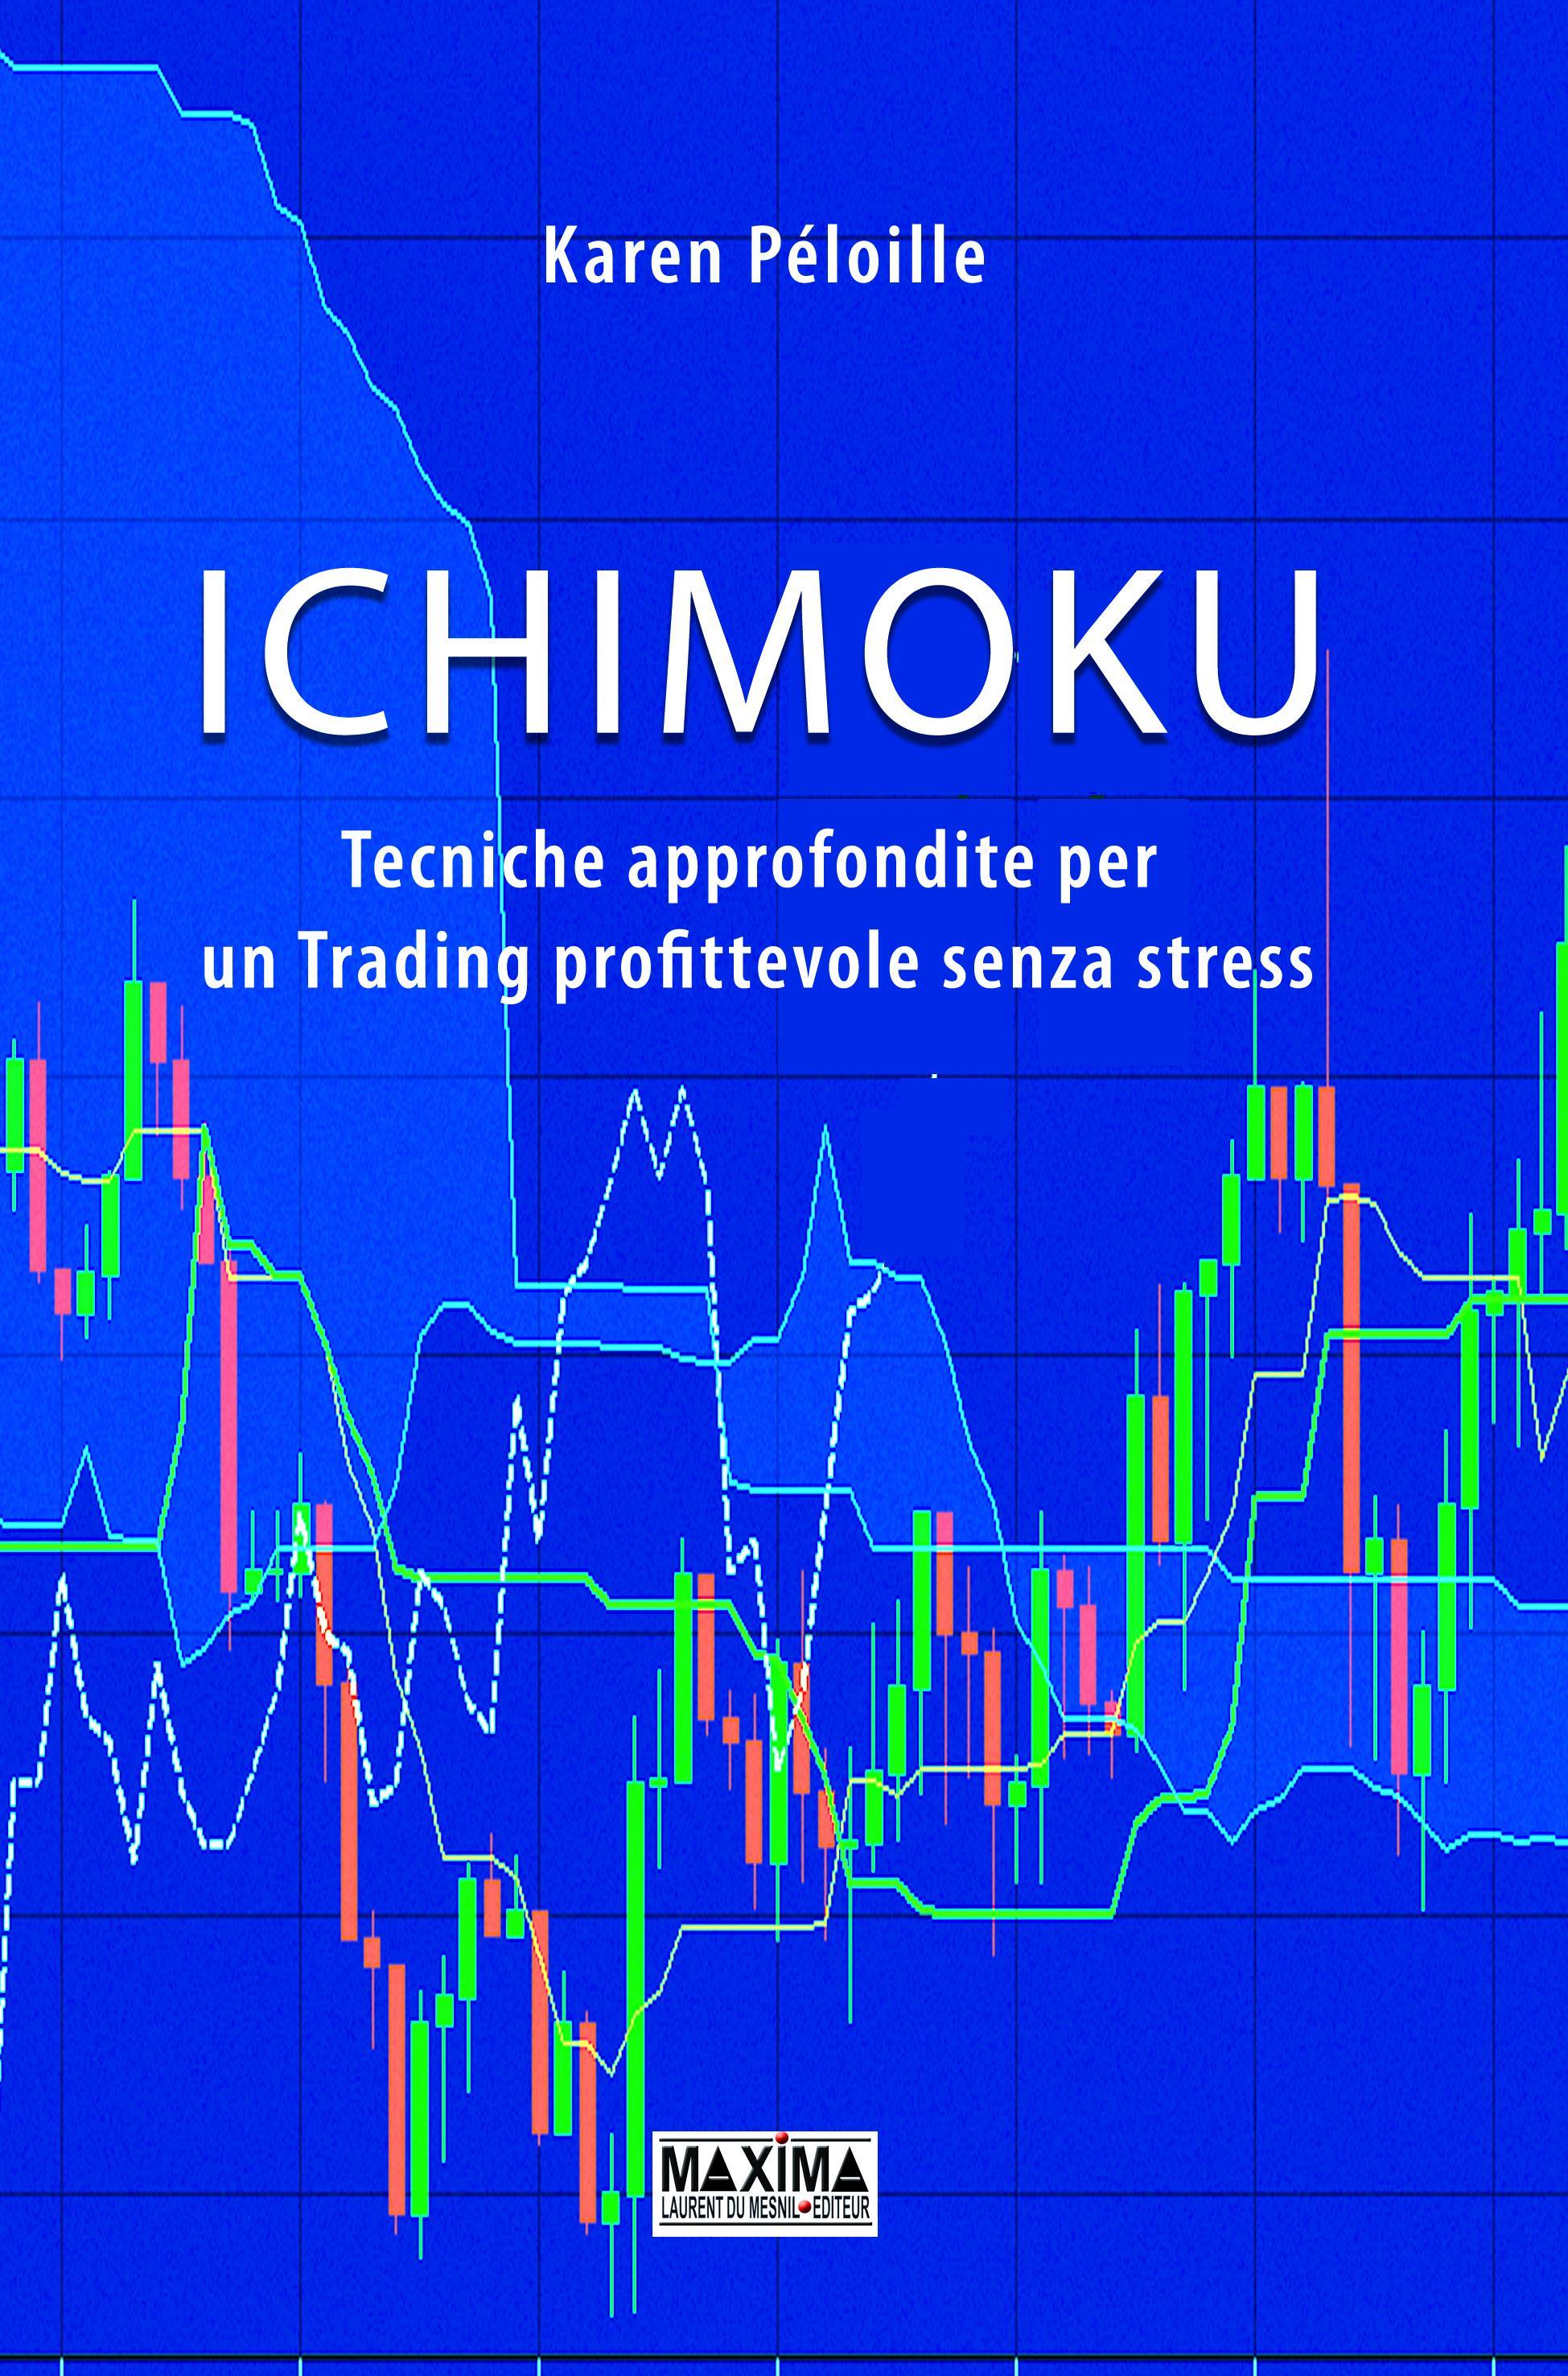 Ichimoku, TECNICHE APPROFONDITE PER UN TRADING PROFITTEVOLE SENZA STRESS